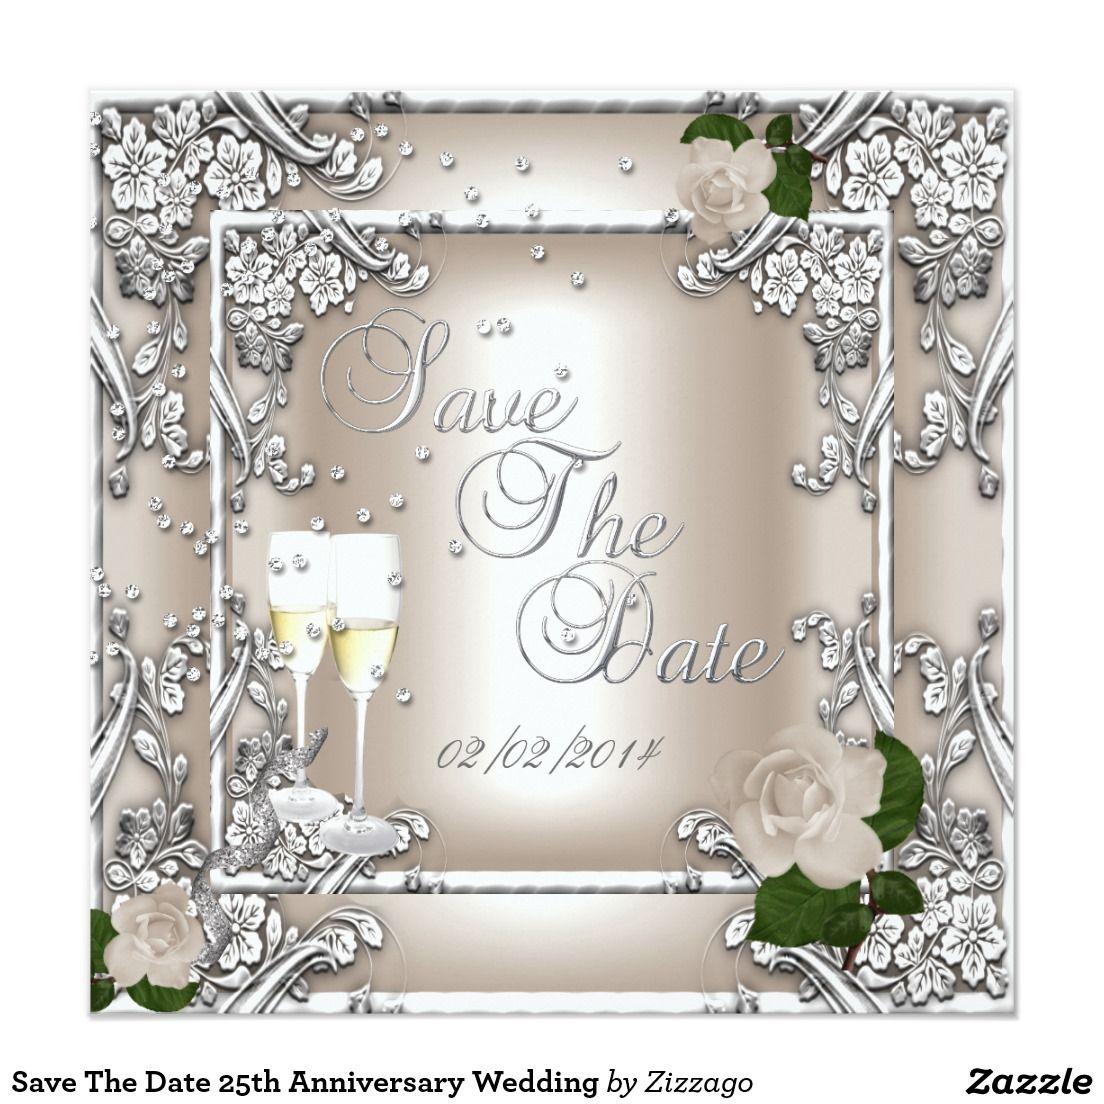 Save The Date 25th Anniversary Wedding Zazzle Com 25th Wedding Anniversary Party 25th Wedding Anniversary Invitations 25th Wedding Anniversary